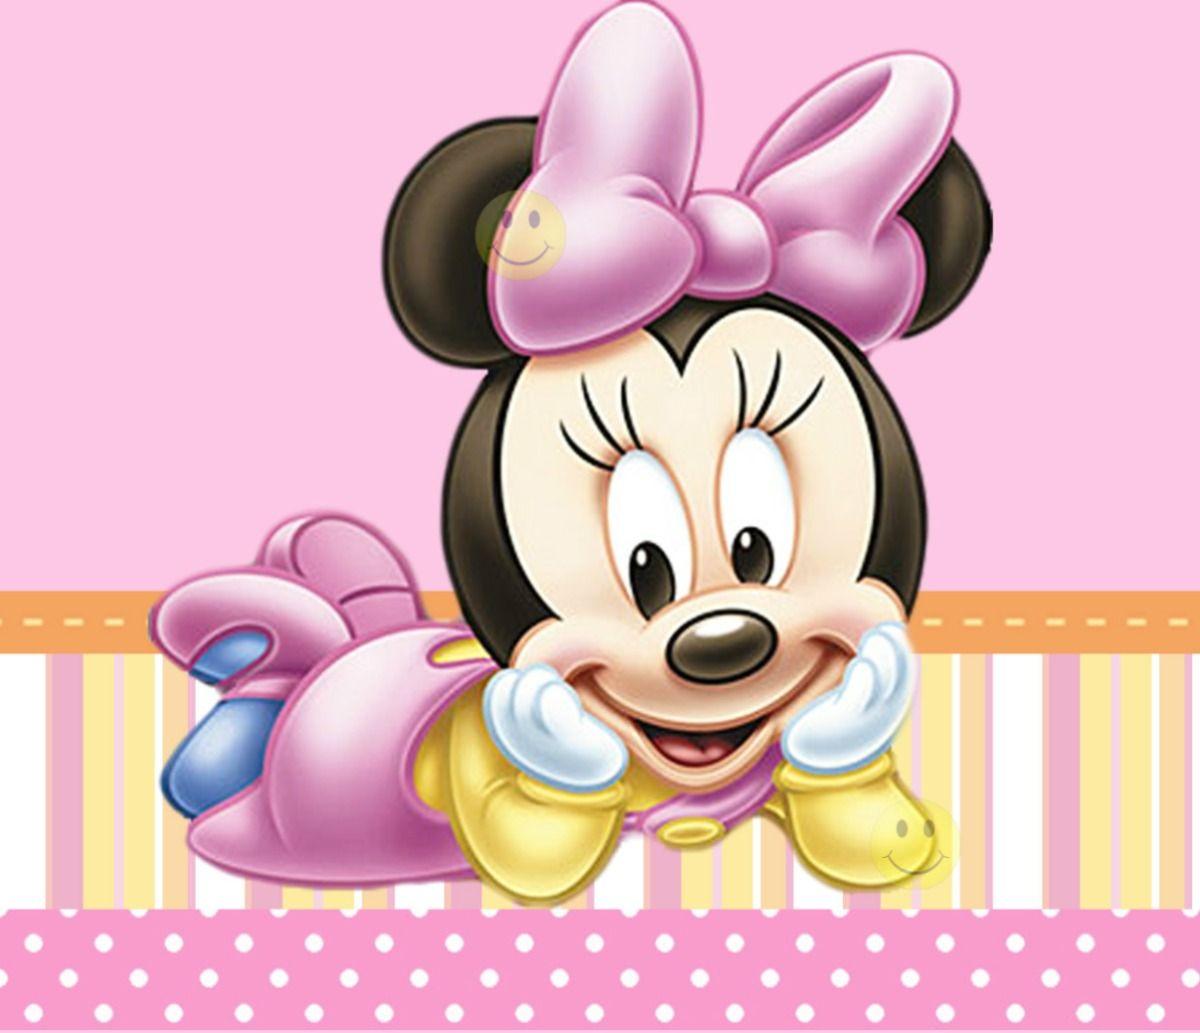 Imagenes de mimi mouse wallpapers 112 wallpapers art wallpapers - Image minnie bebe ...